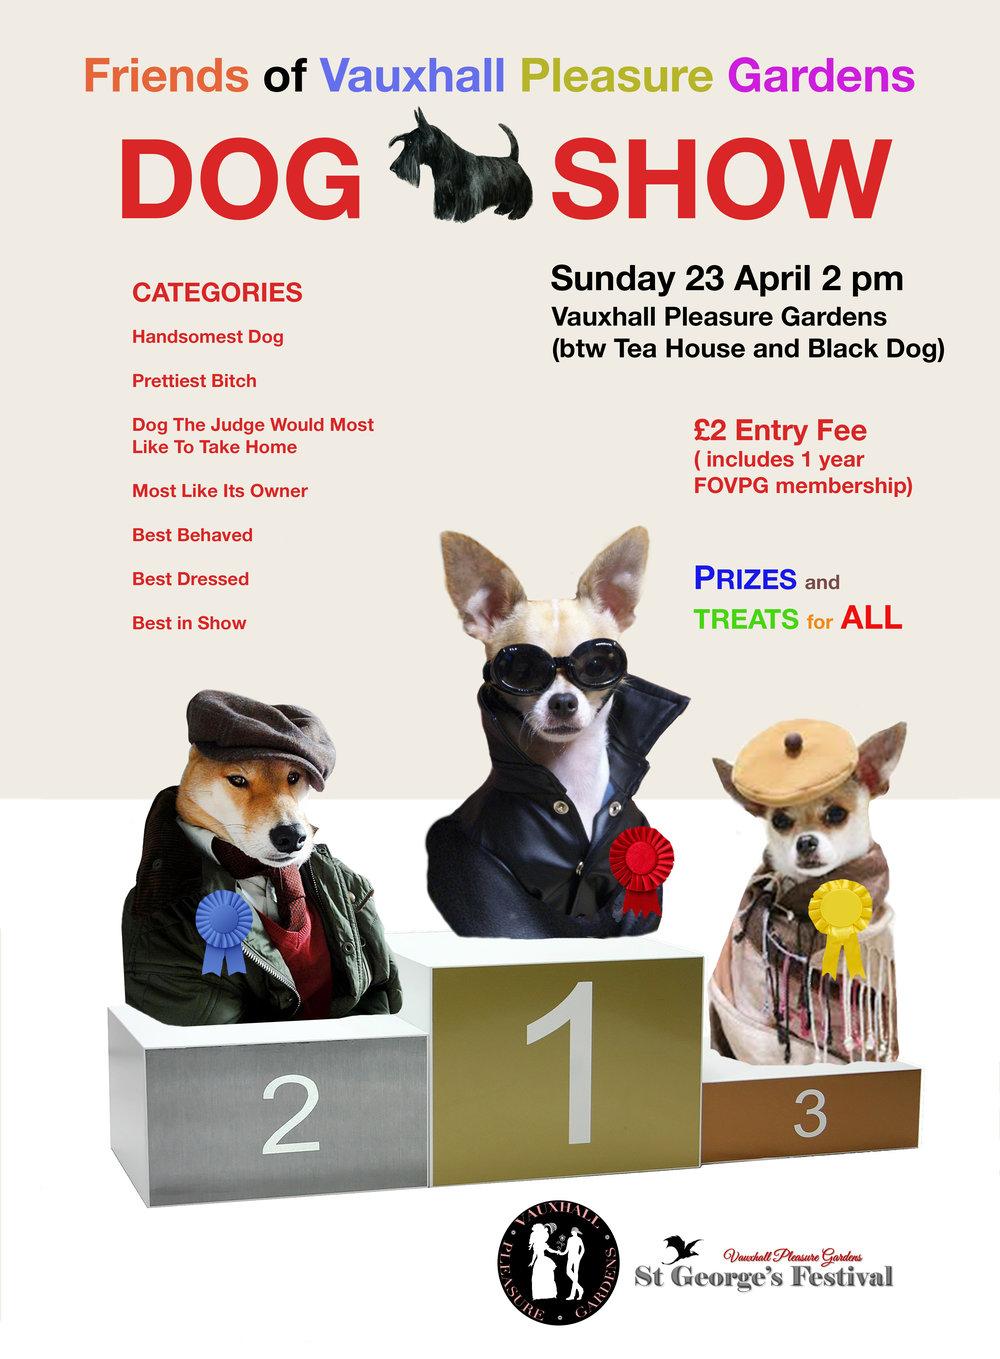 FOVPG dog show copy.jpg